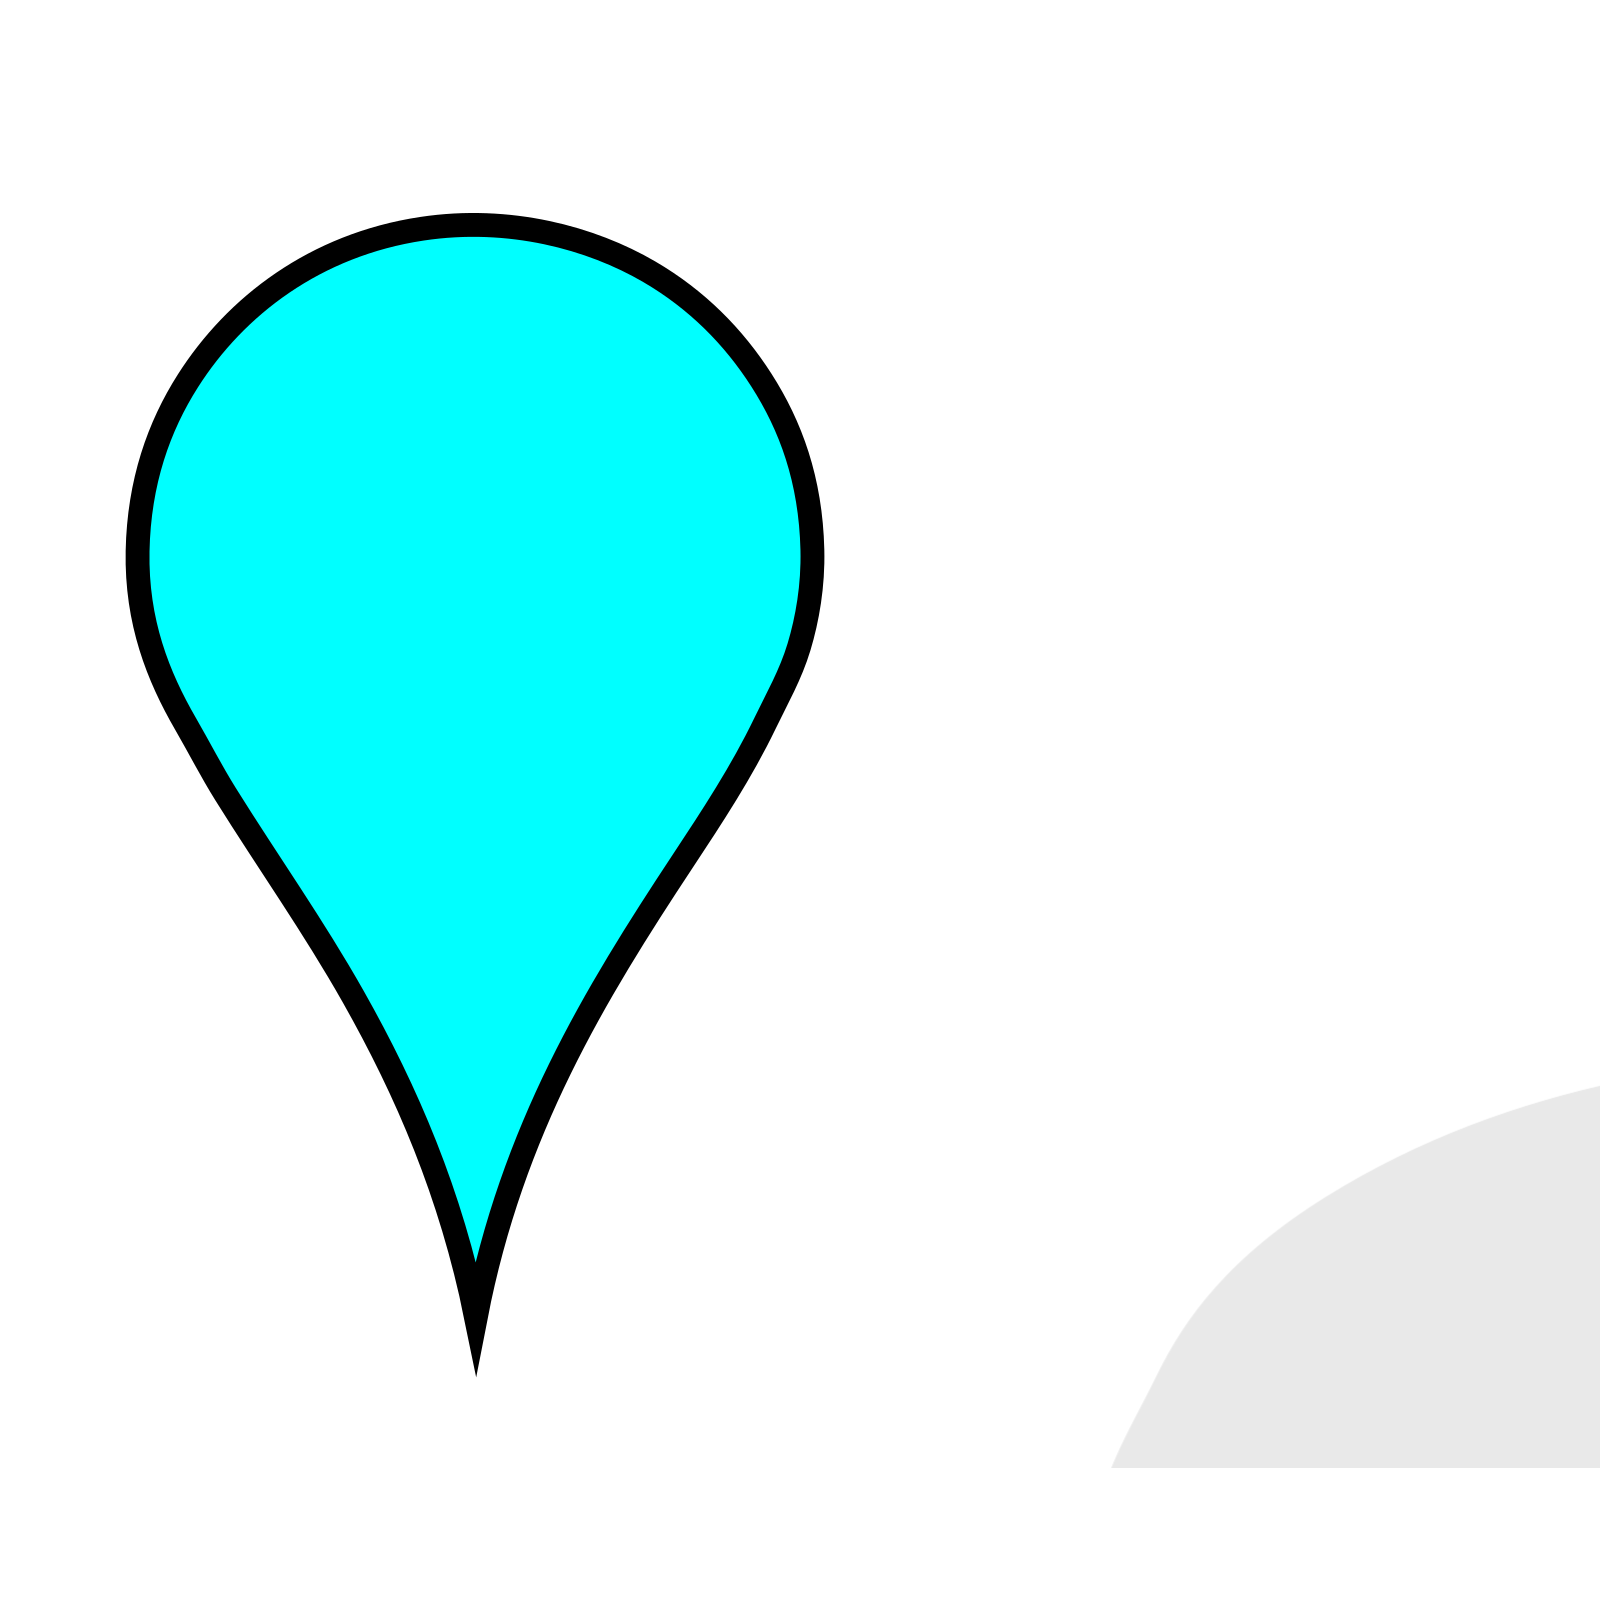 Google Maps Pin Svg Vector Google Maps Pin Clip Art Svg Clipart